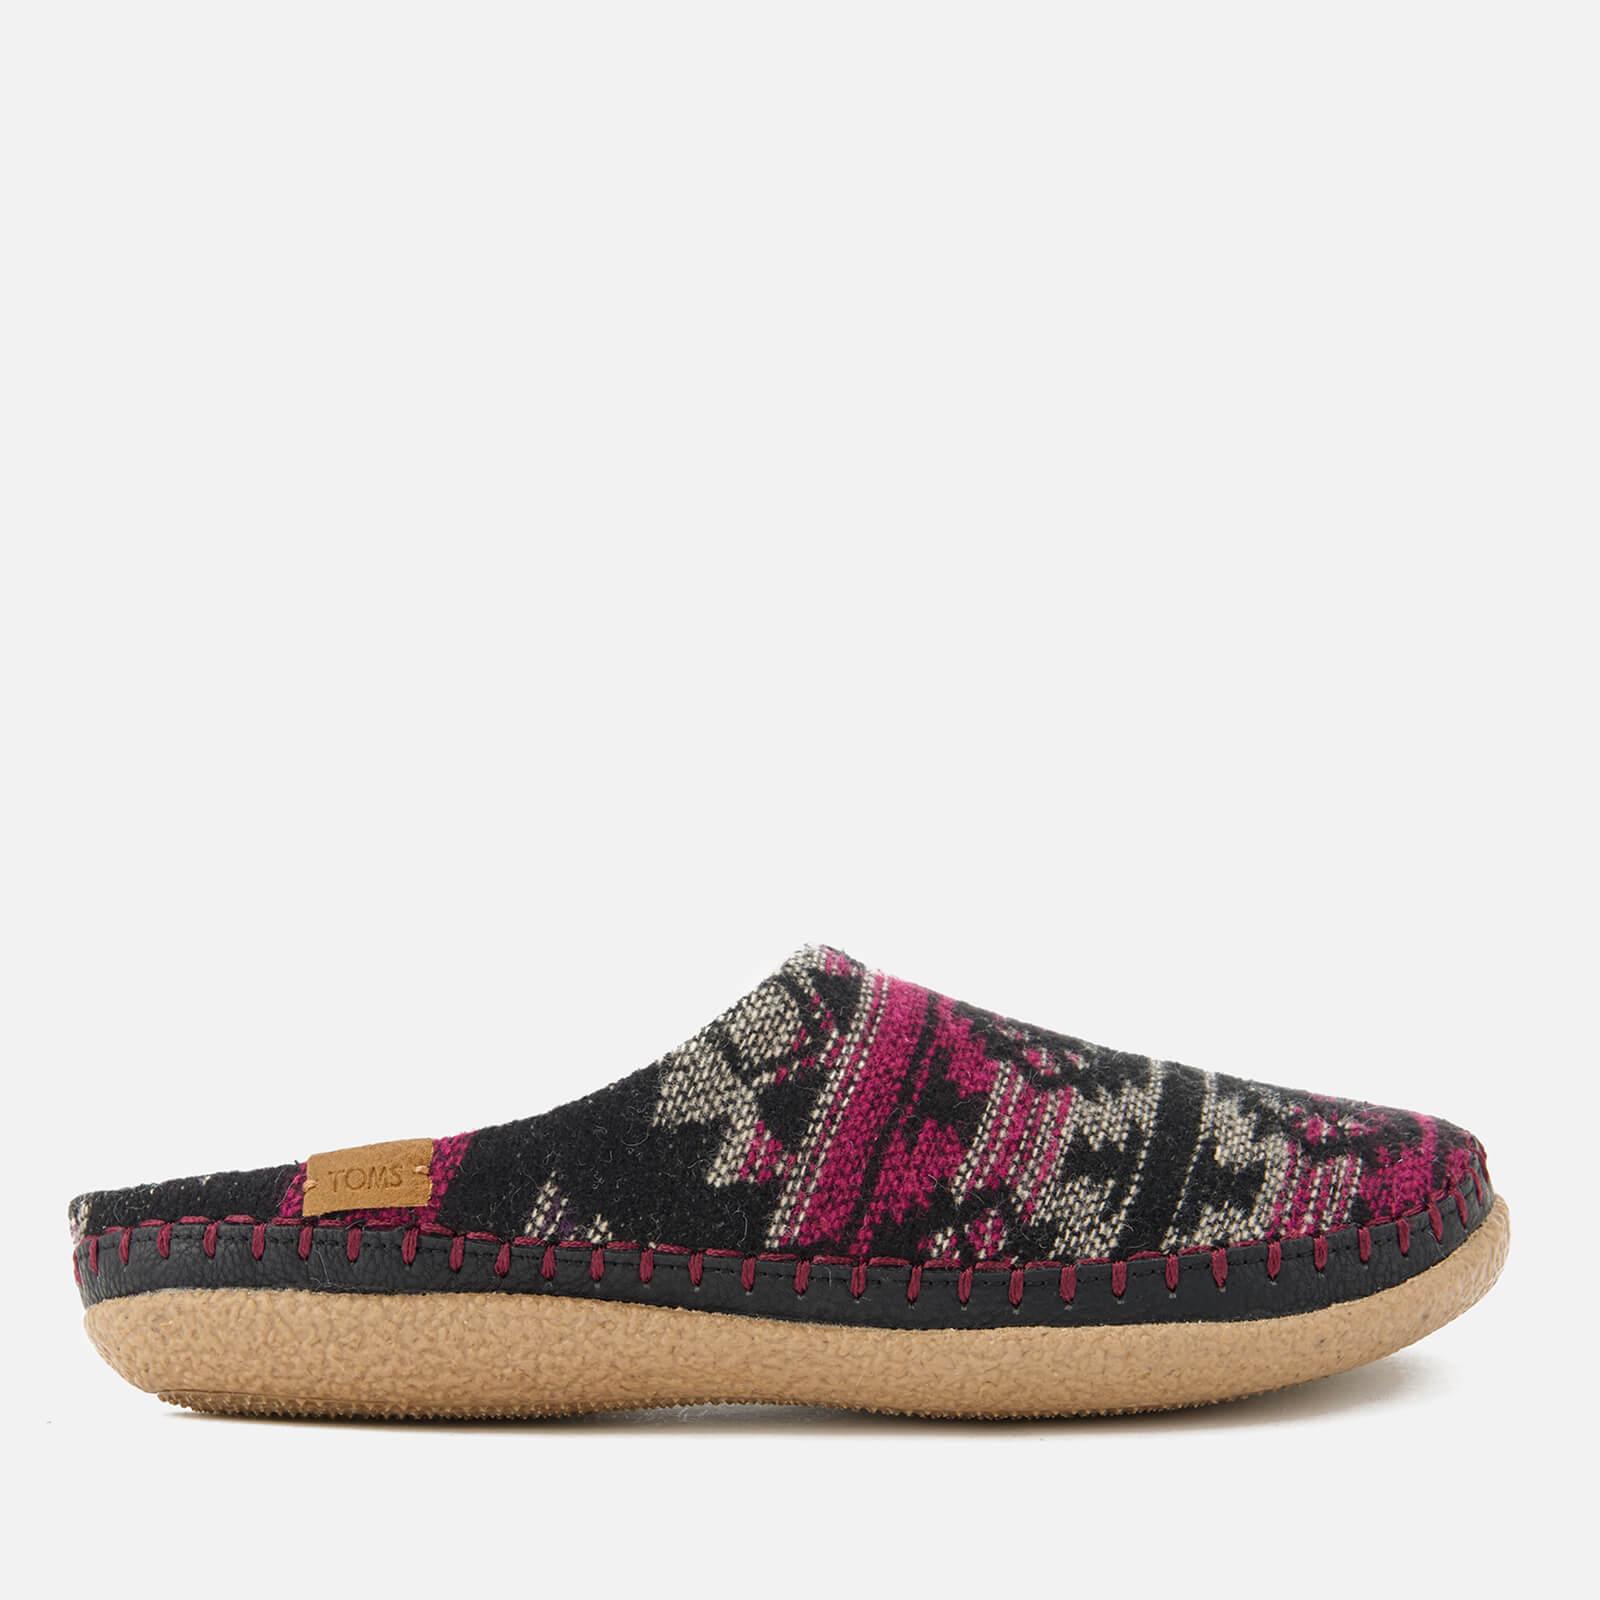 1fdf0c4bdc9 TOMS Women's Ivy Woollen Slippers - Grey/Fuchsia Tribal